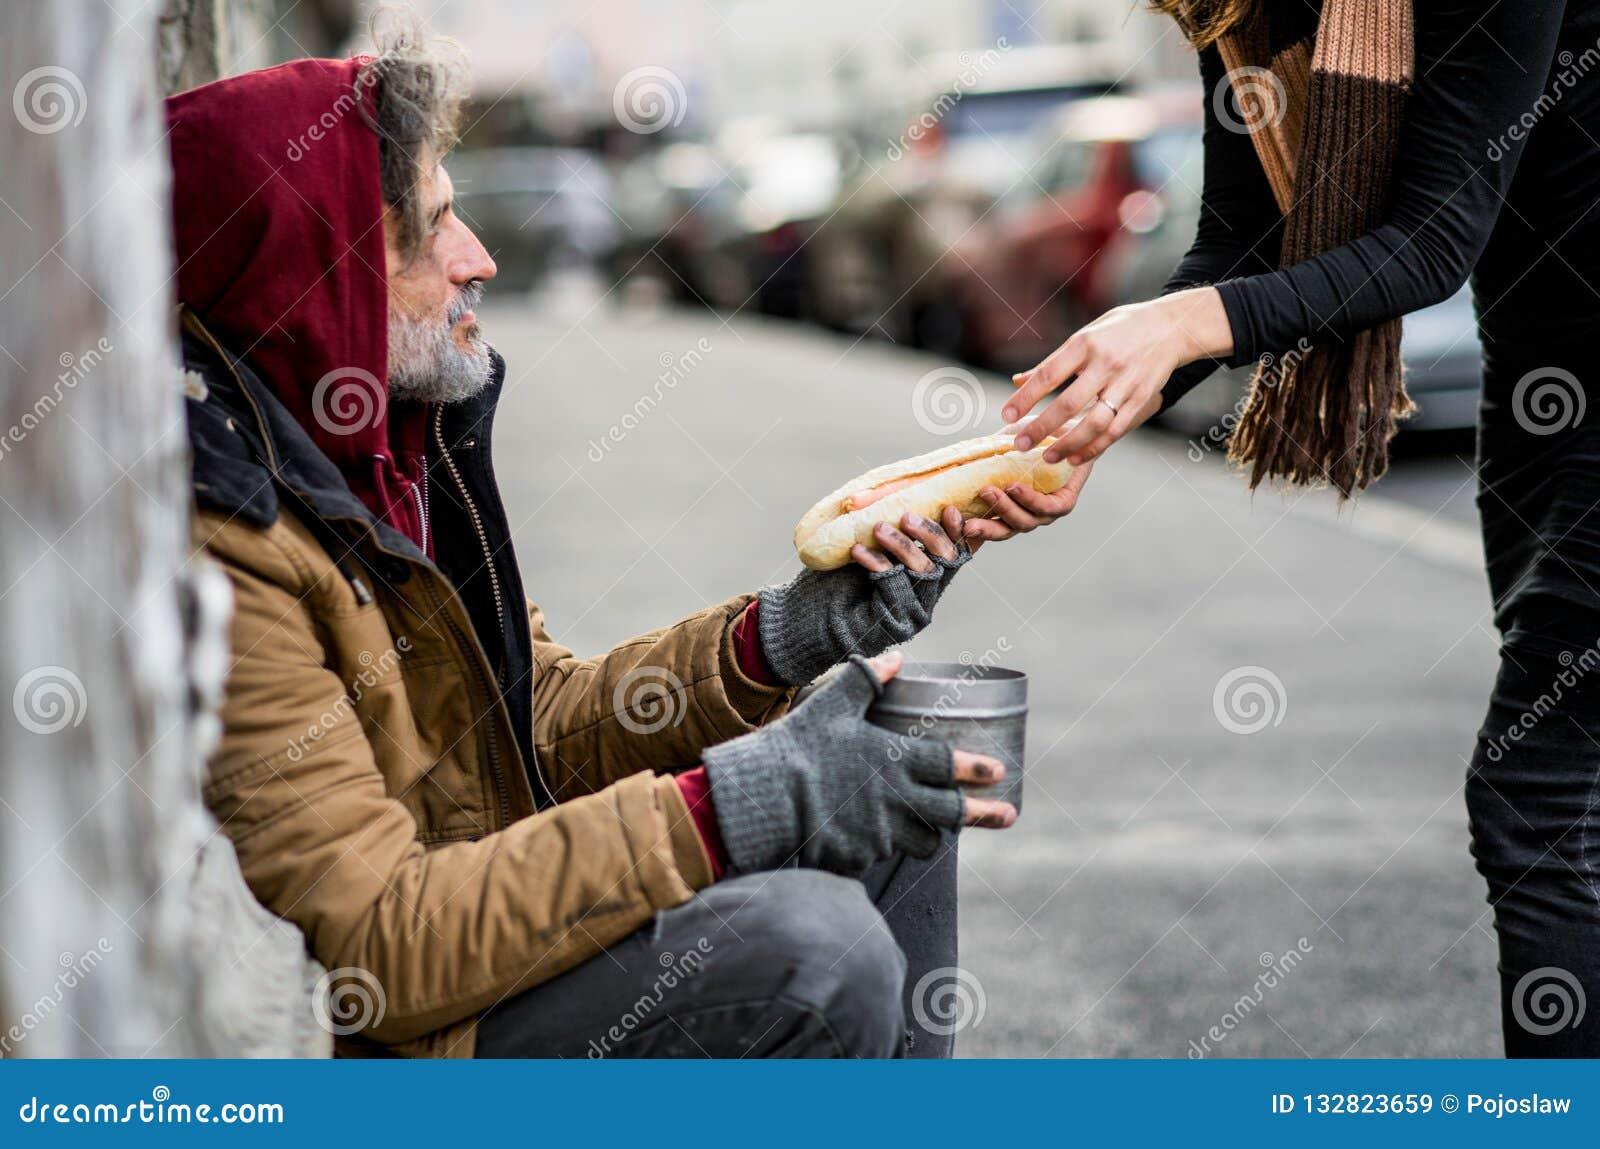 Unrecognizable γυναίκα που δίνει τα τρόφιμα στην άστεγη συνεδρίαση ανδρών επαιτών στην πόλη